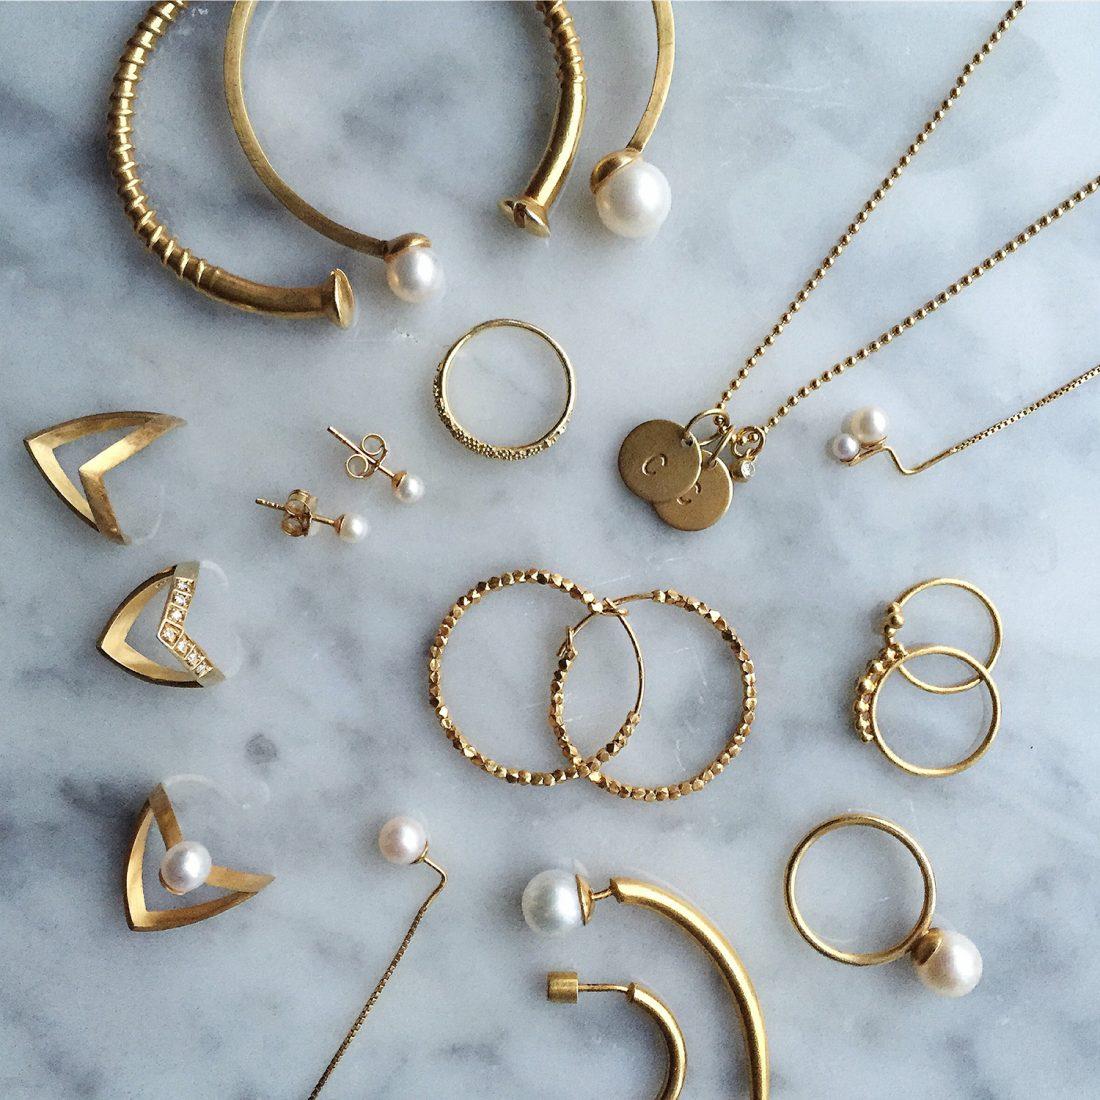 3a75608d5a5 smykker - Christina Dueholm